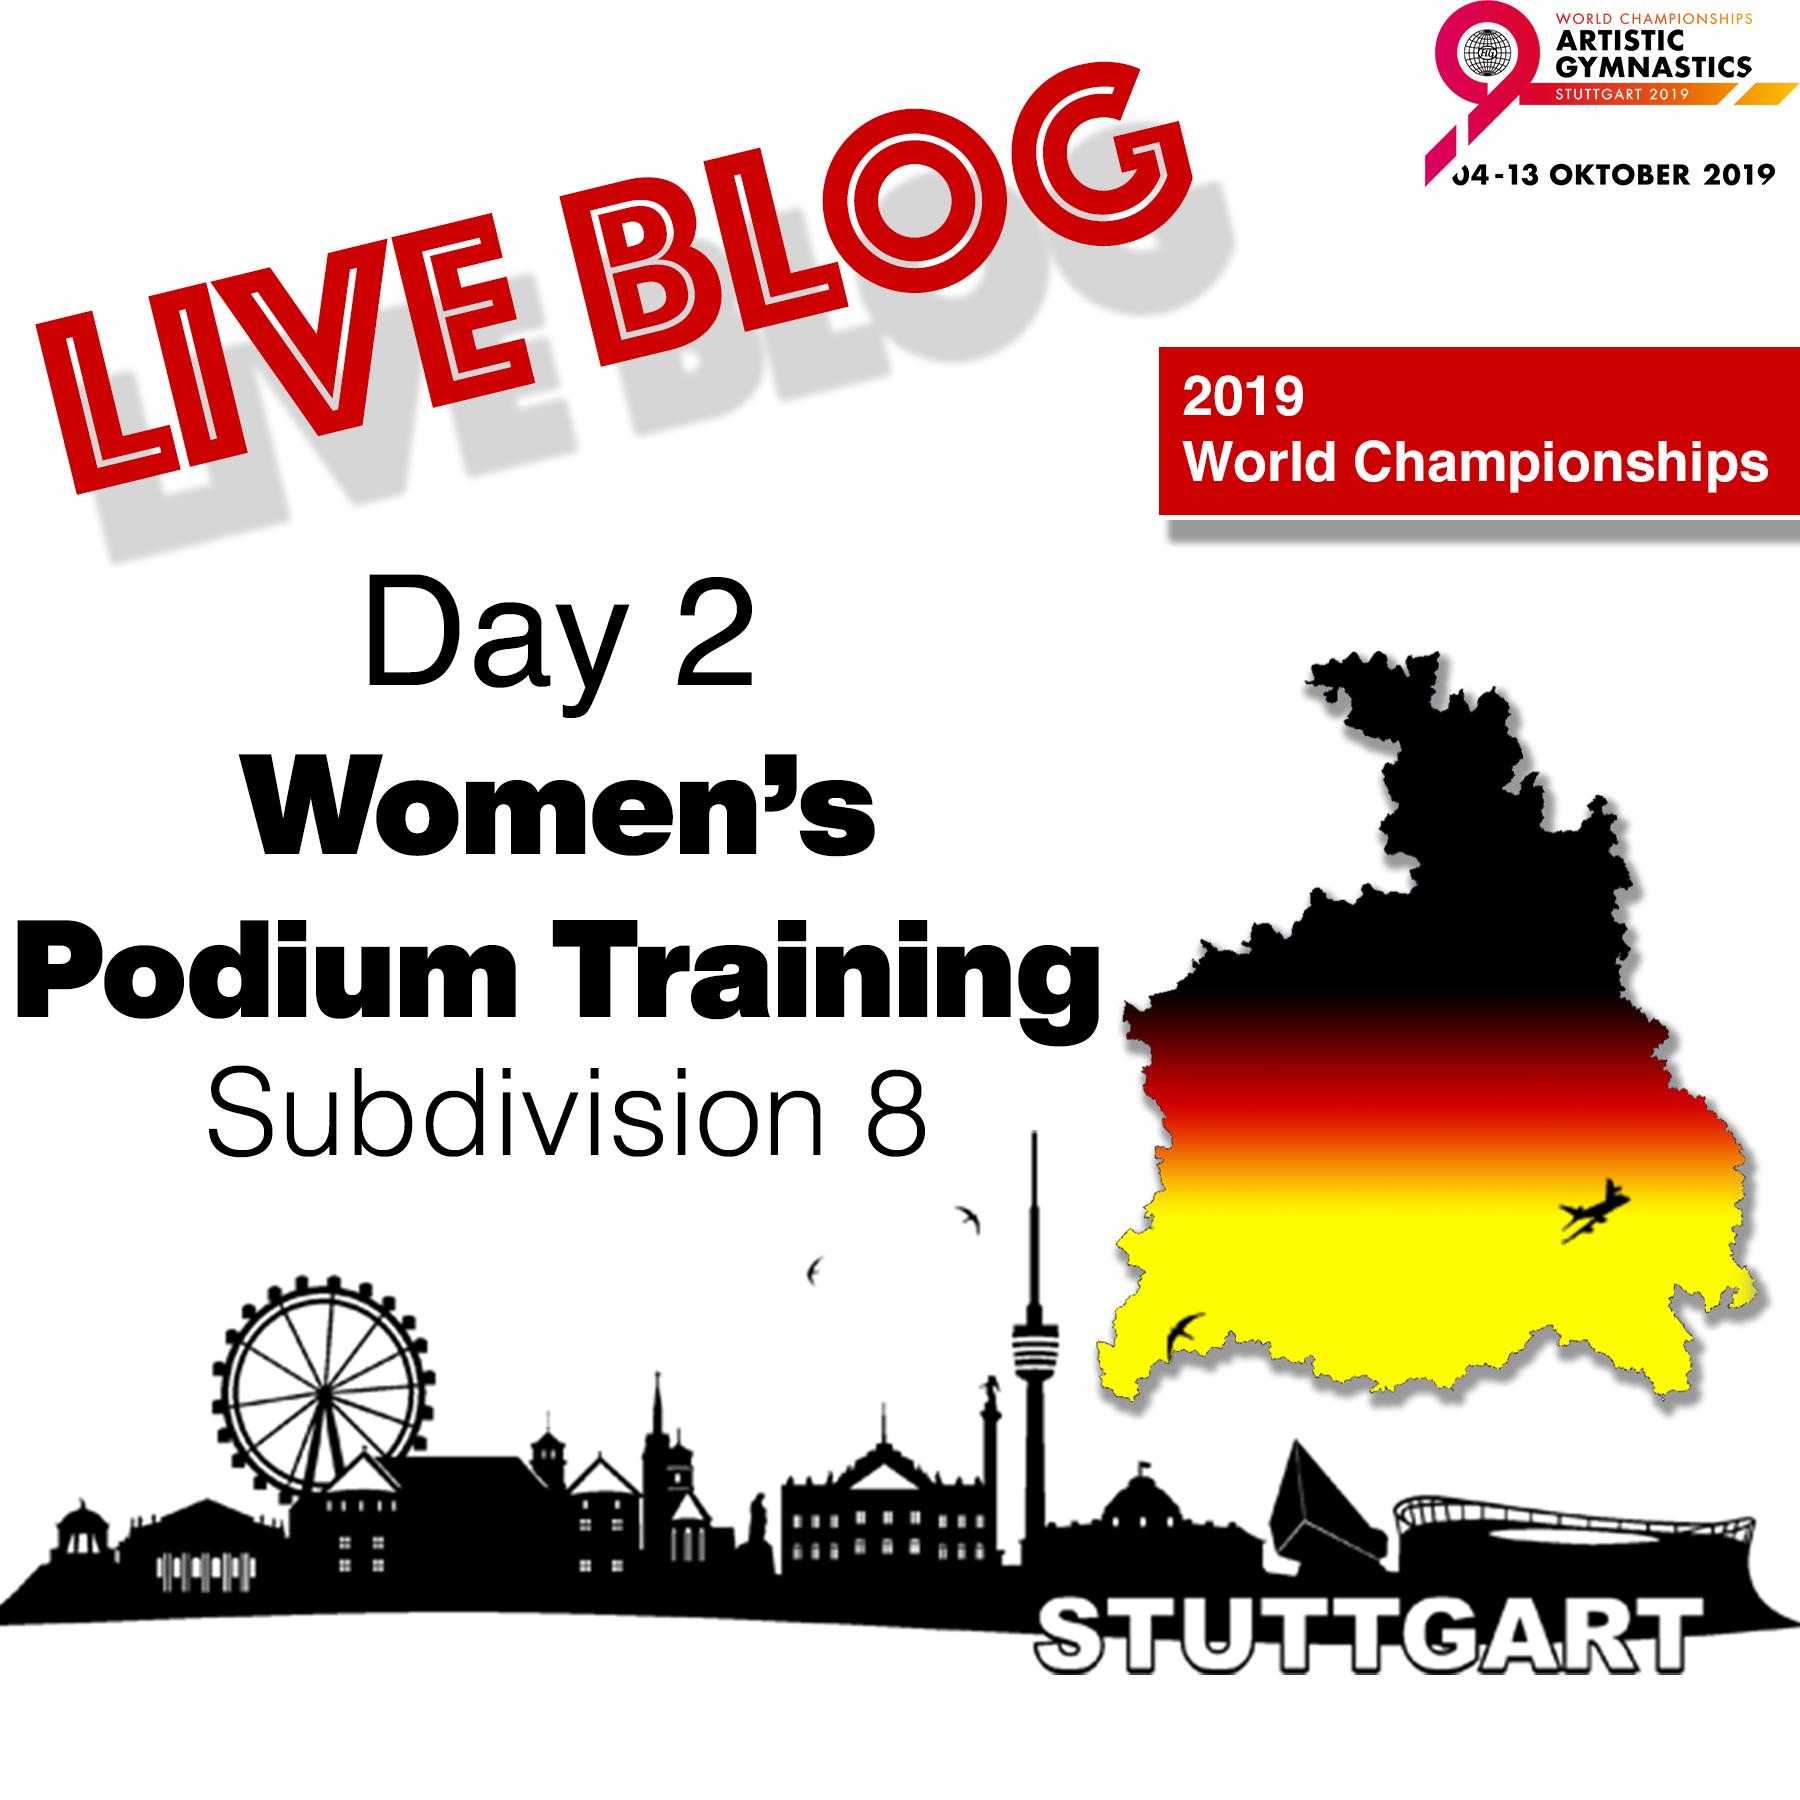 Live Blog: 2019 World Championships – WAG Podium Training – Sub Division 8, Oct. 1st